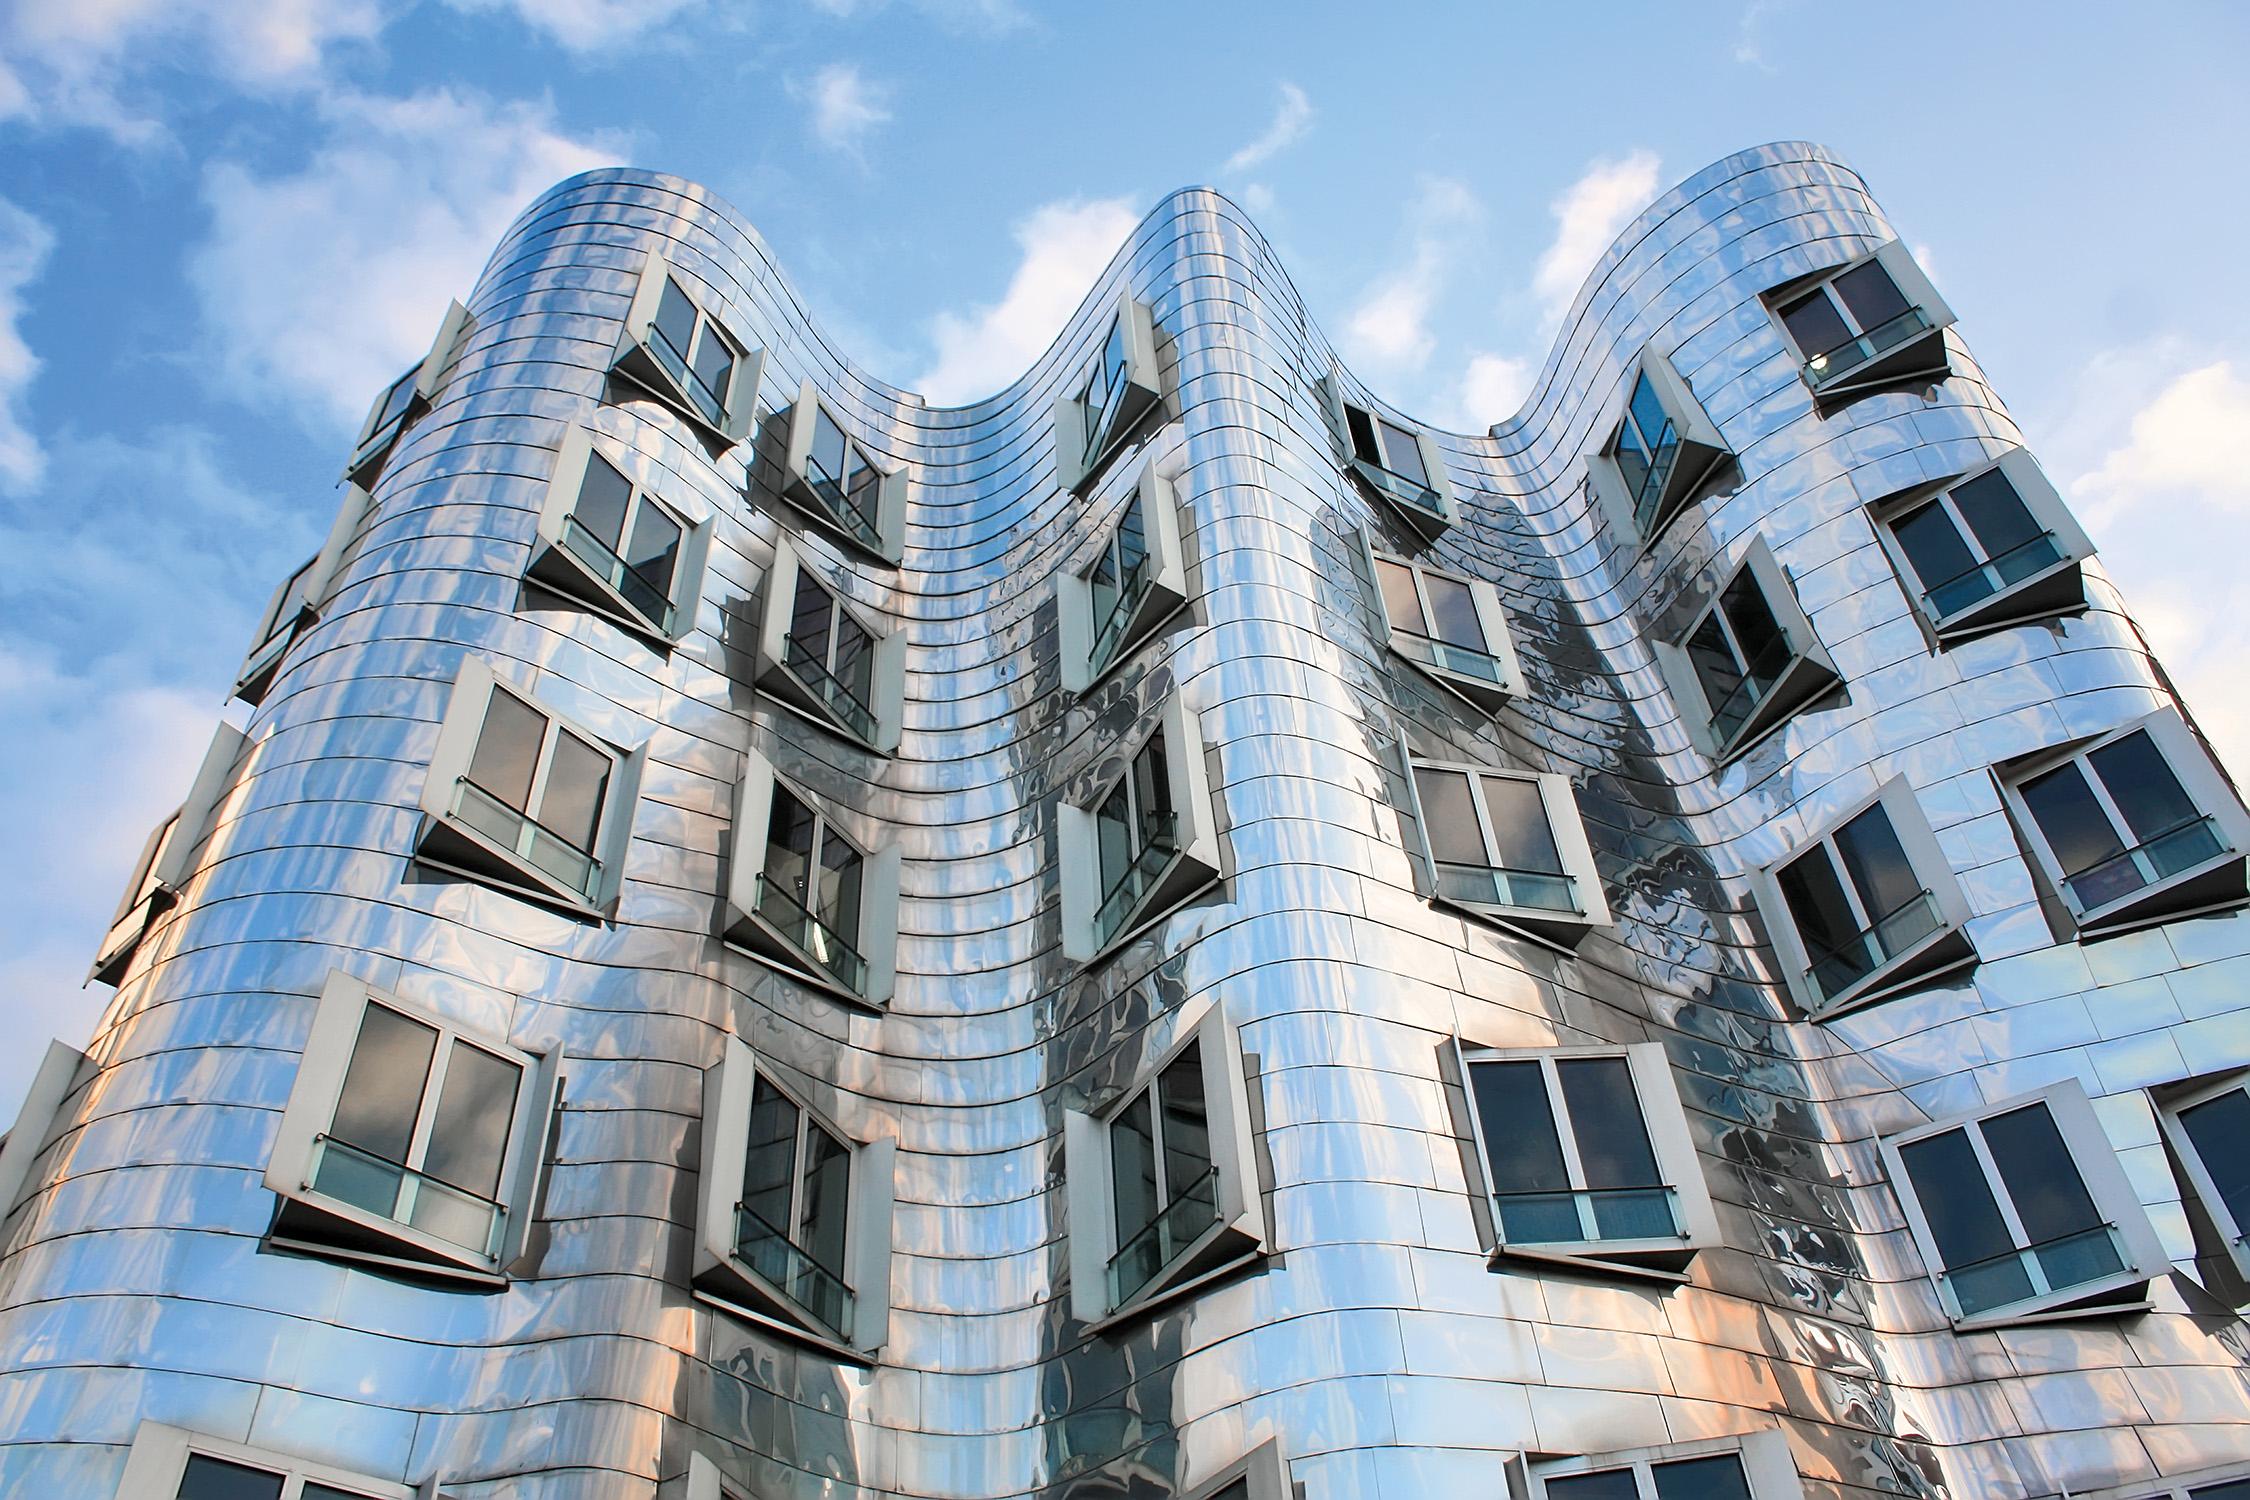 Frank-Gehry-Neuer-Zollhof-Duesseldorf-Venice-travel-Nila-Do-Simon